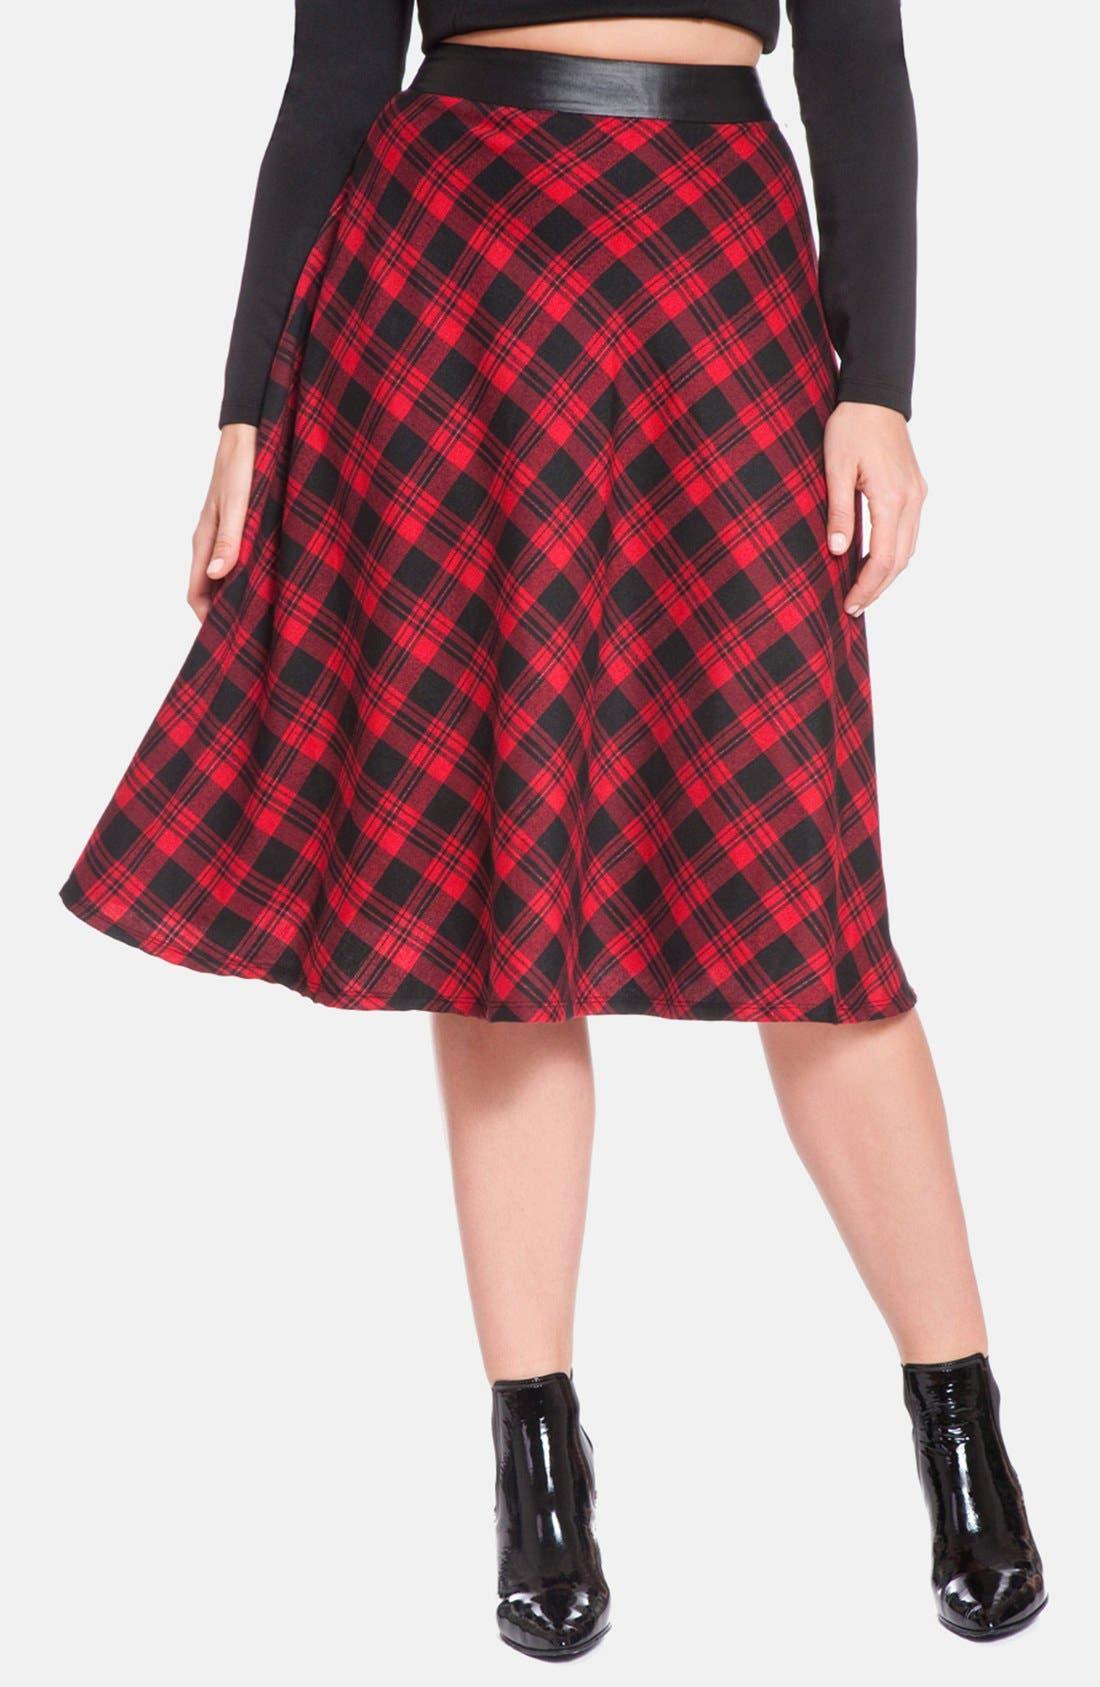 Main Image - ELOQUII Tartan Plaid Midi Skirt (Plus Size)